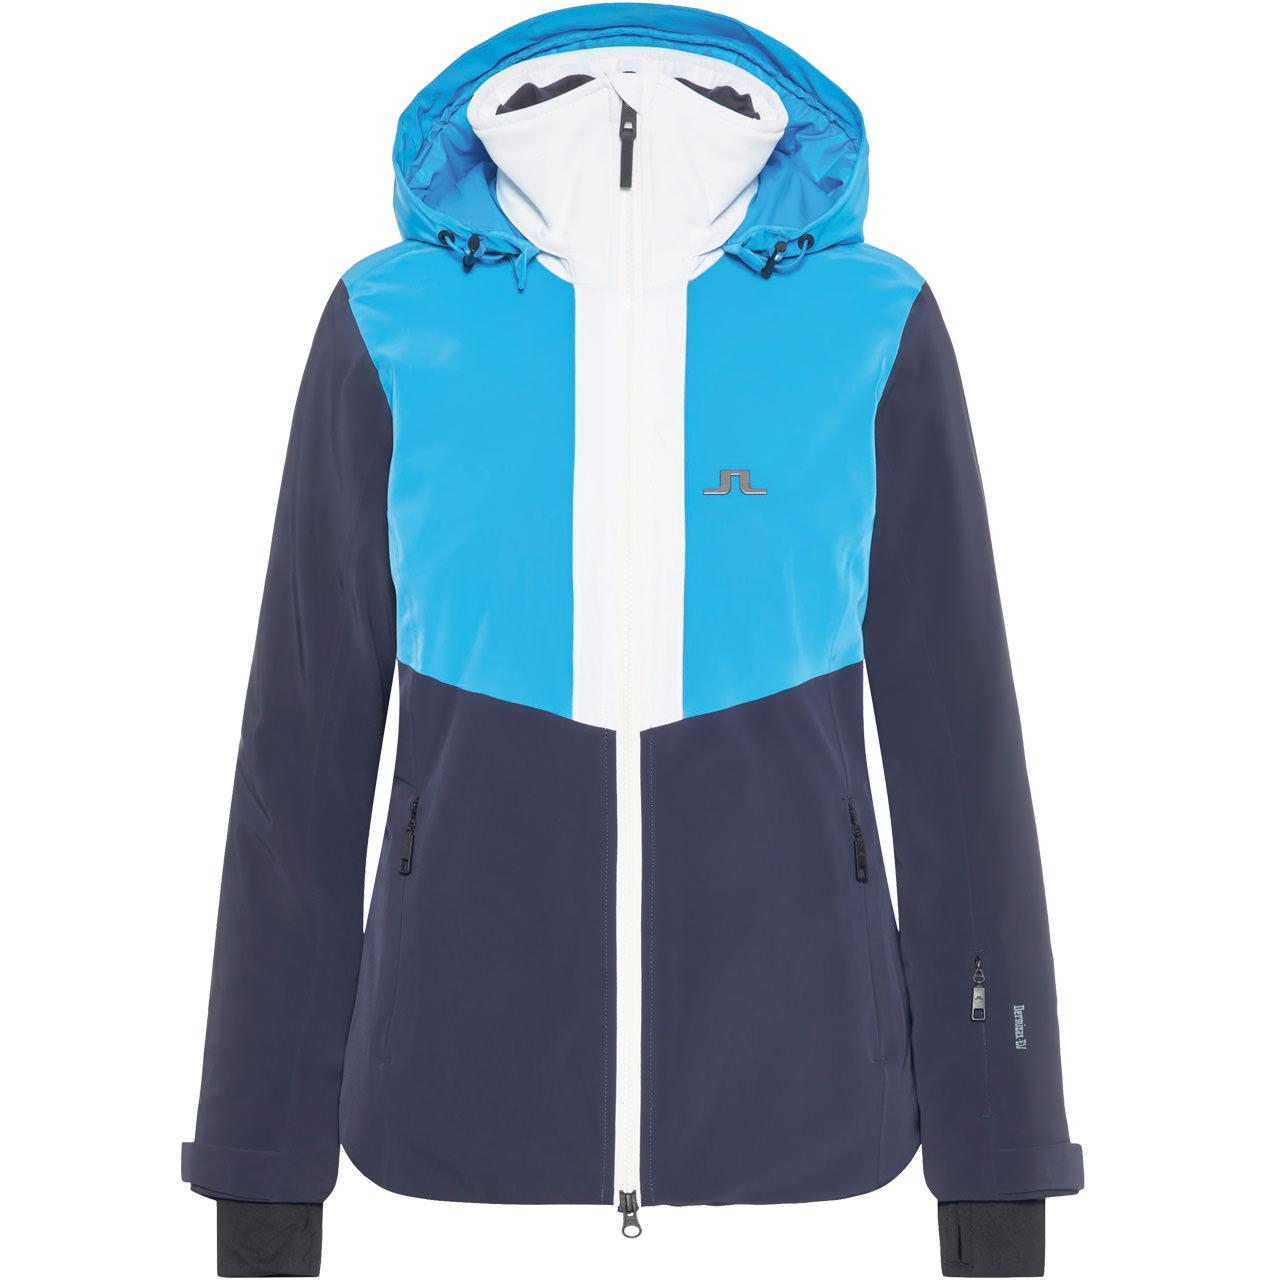 J.Lindeberg Women Jacket GAB fancy bluenavy